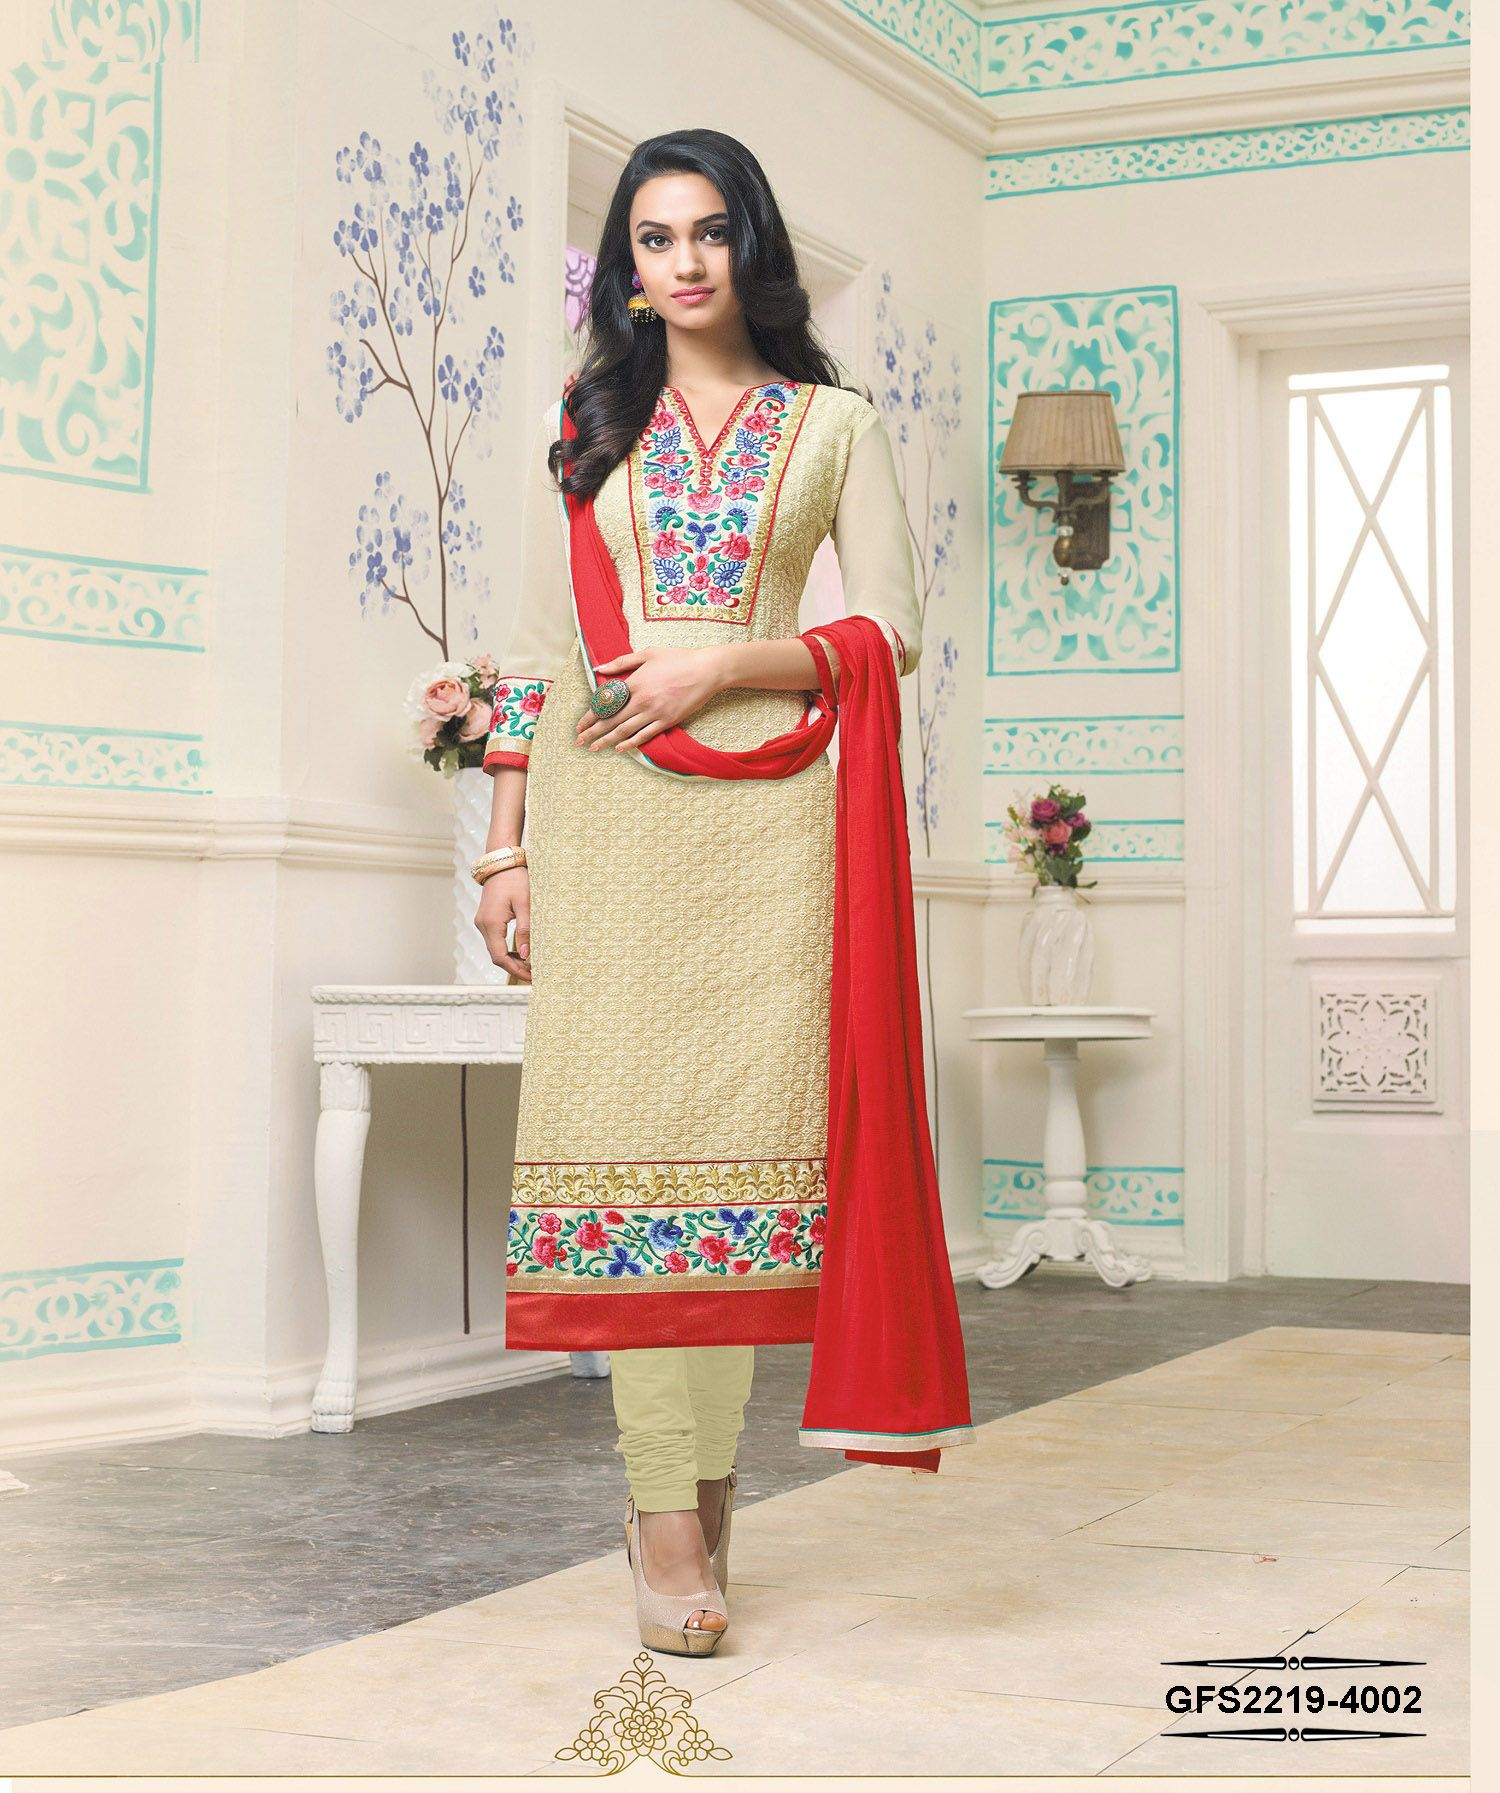 Buy this dress goohejdi kastoori embroidery